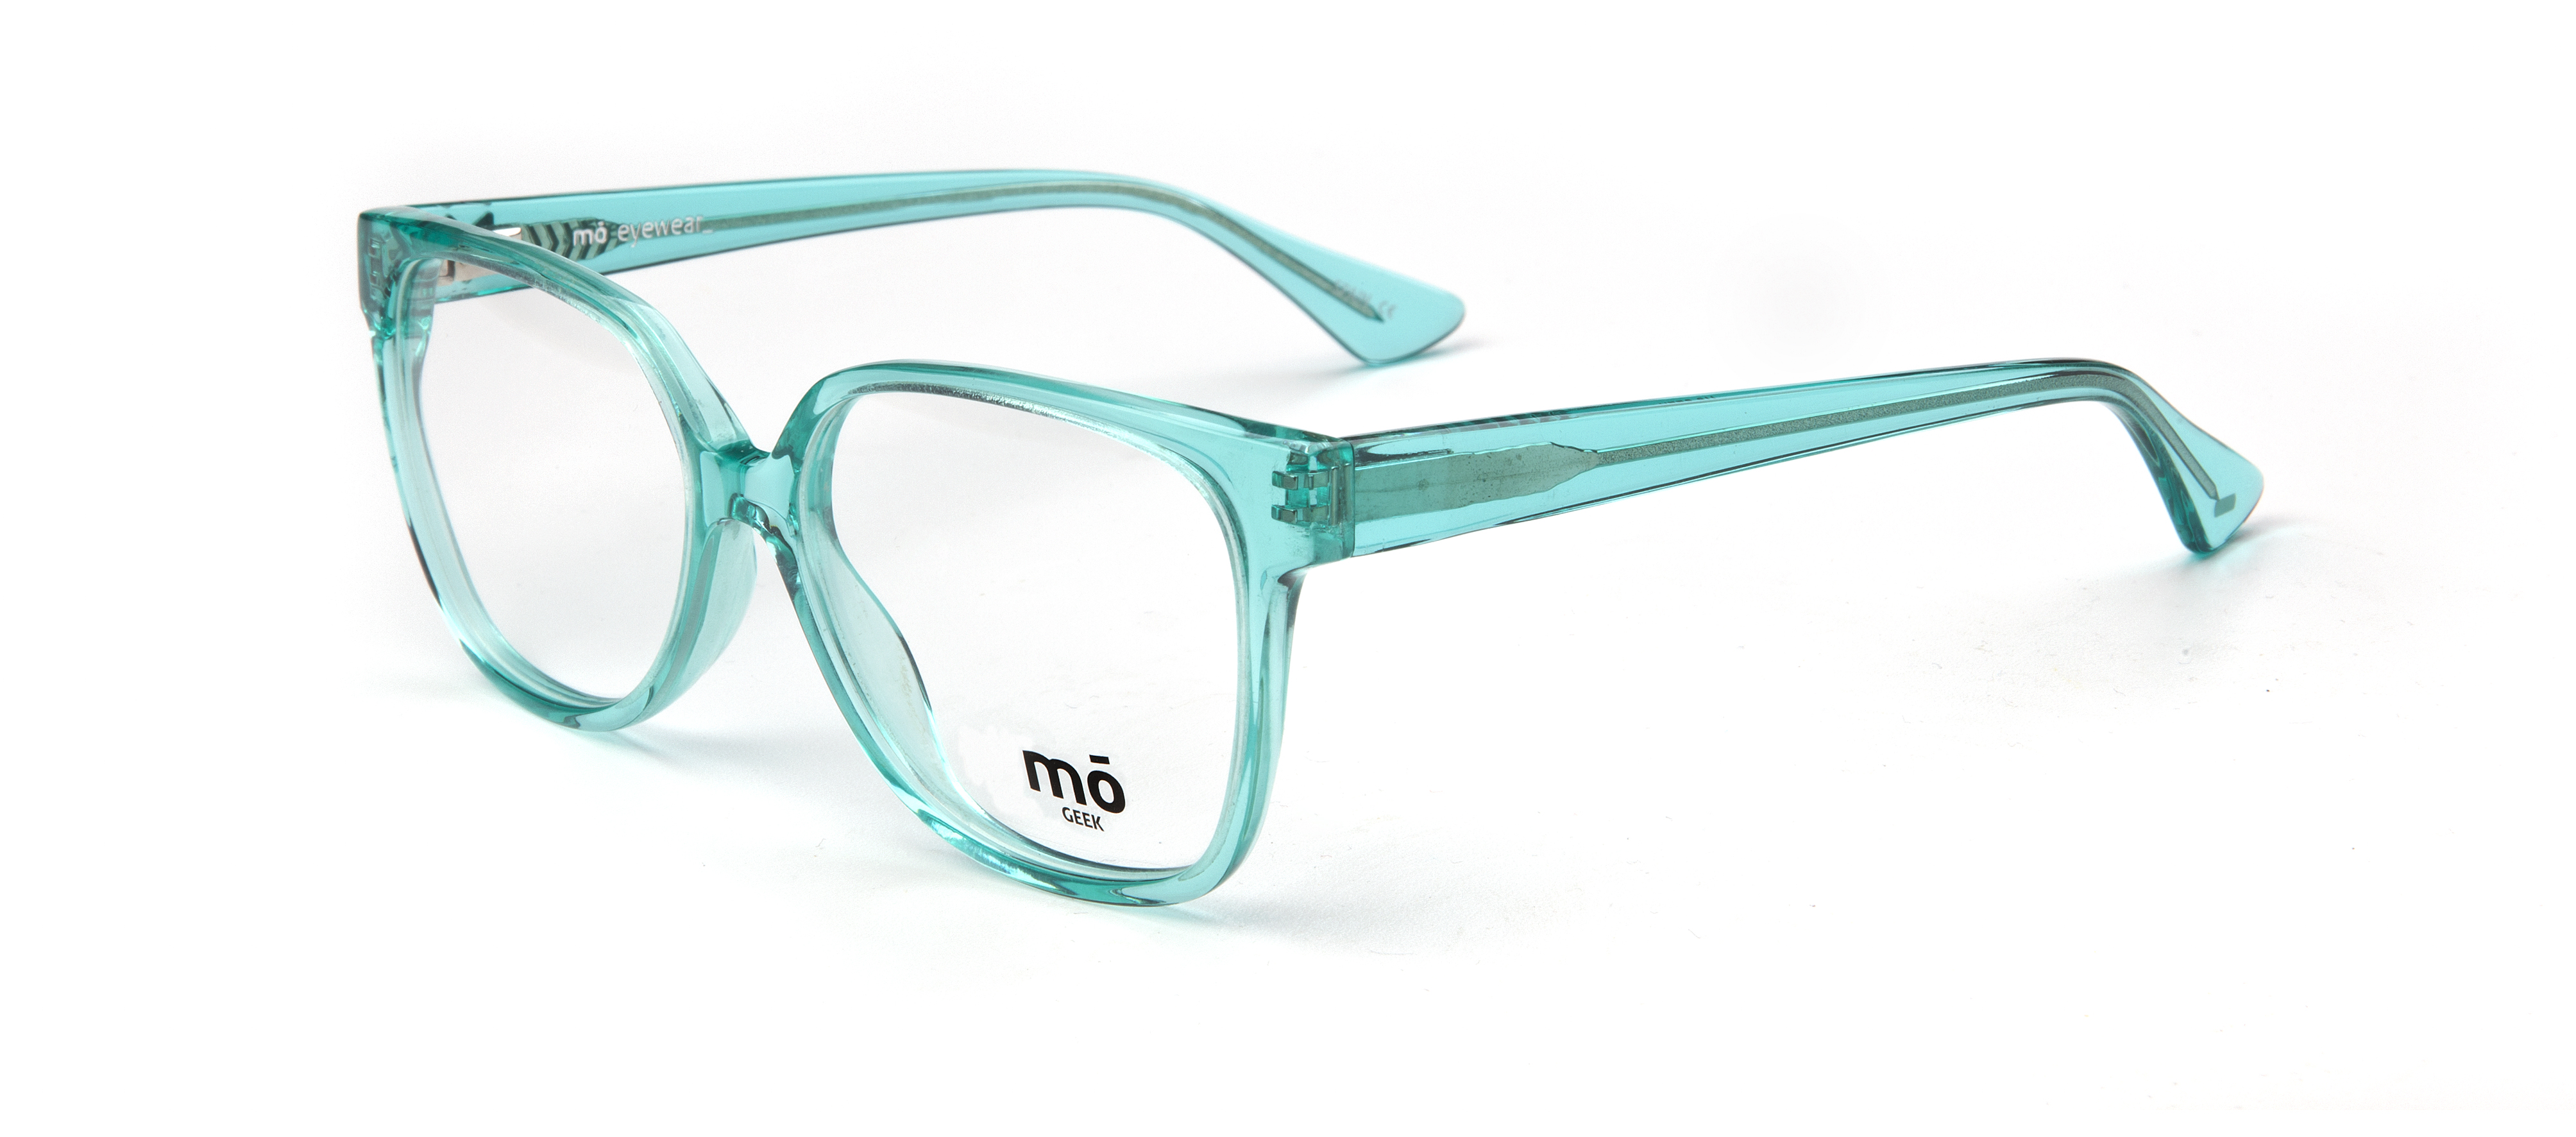 Las gafas de la semana m geek 24a a gral motvblog for Gafas de piscina graduadas